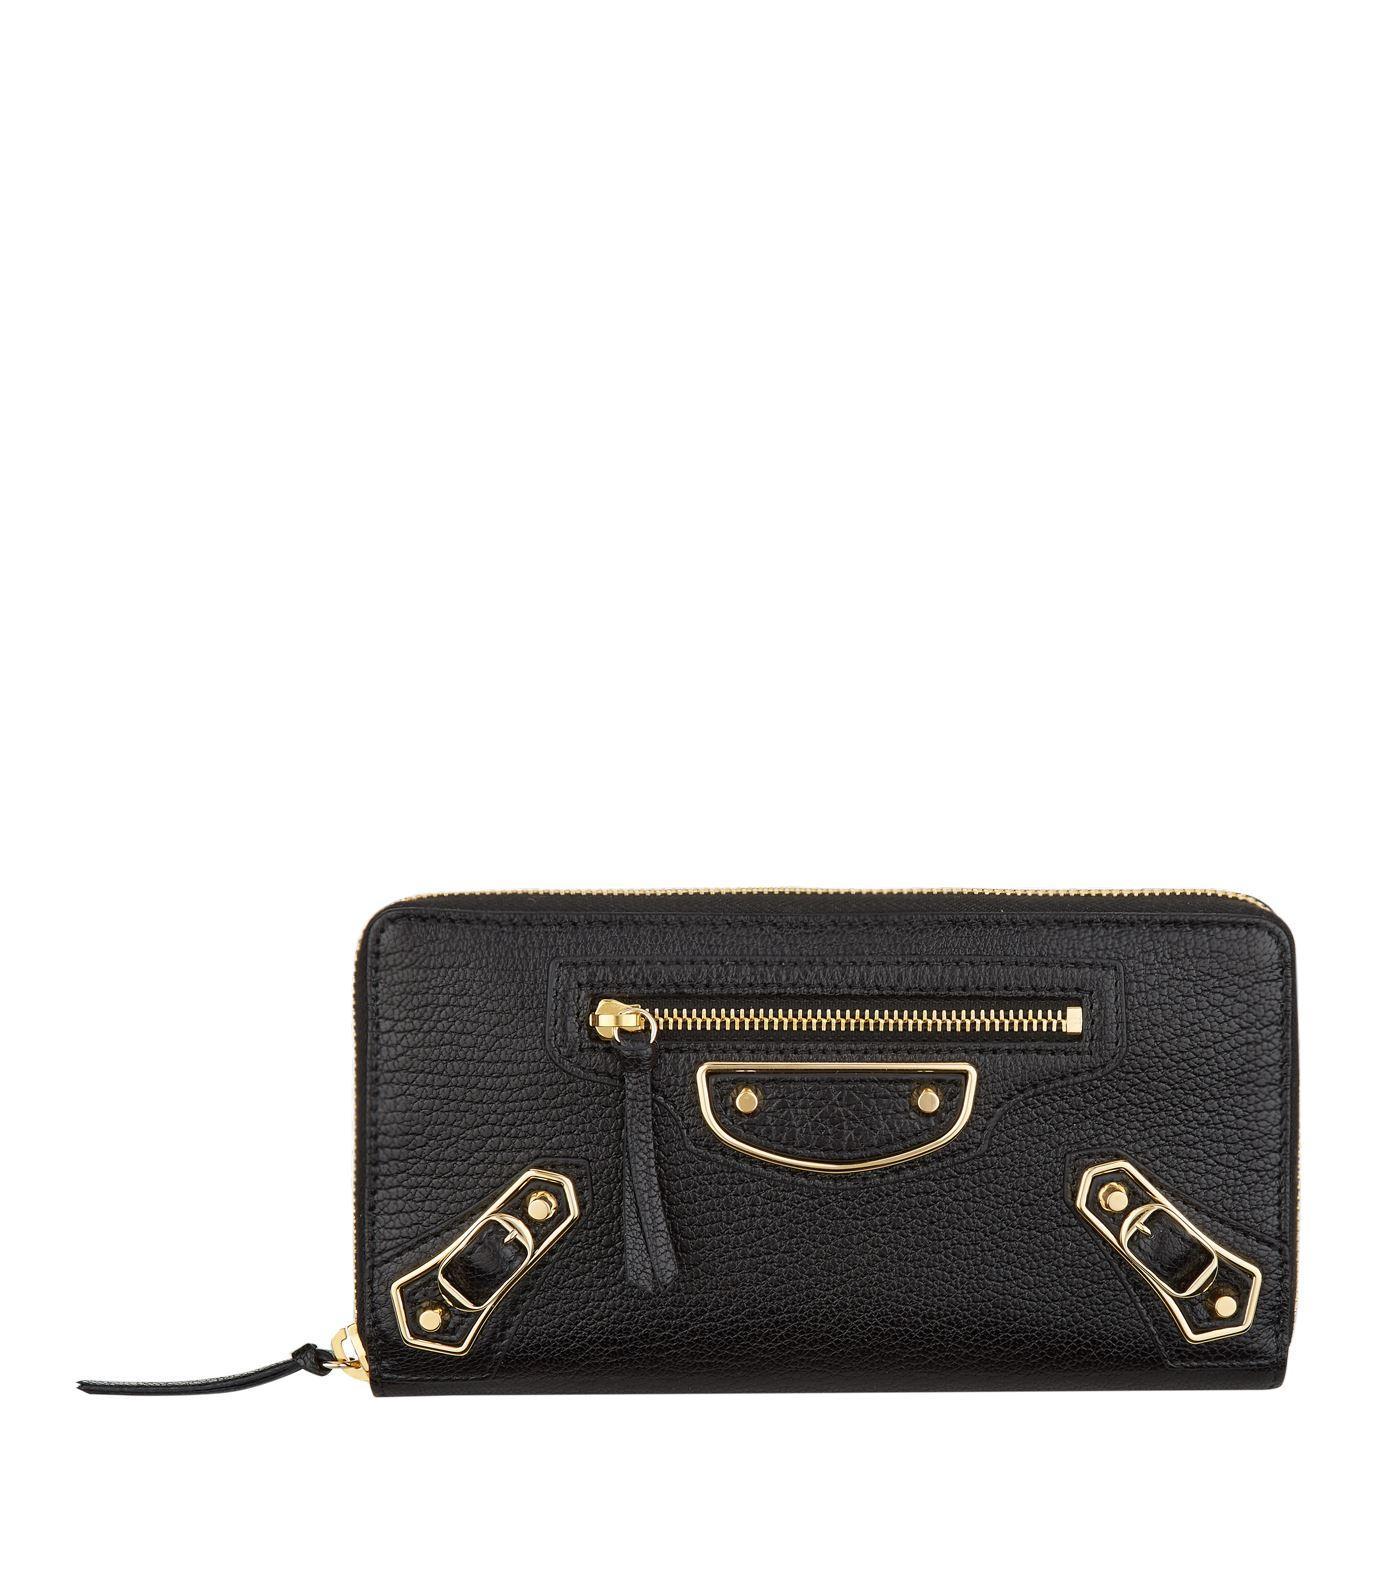 Balenciaga Metallic Edge Textured-leather Continental Wallet In Black